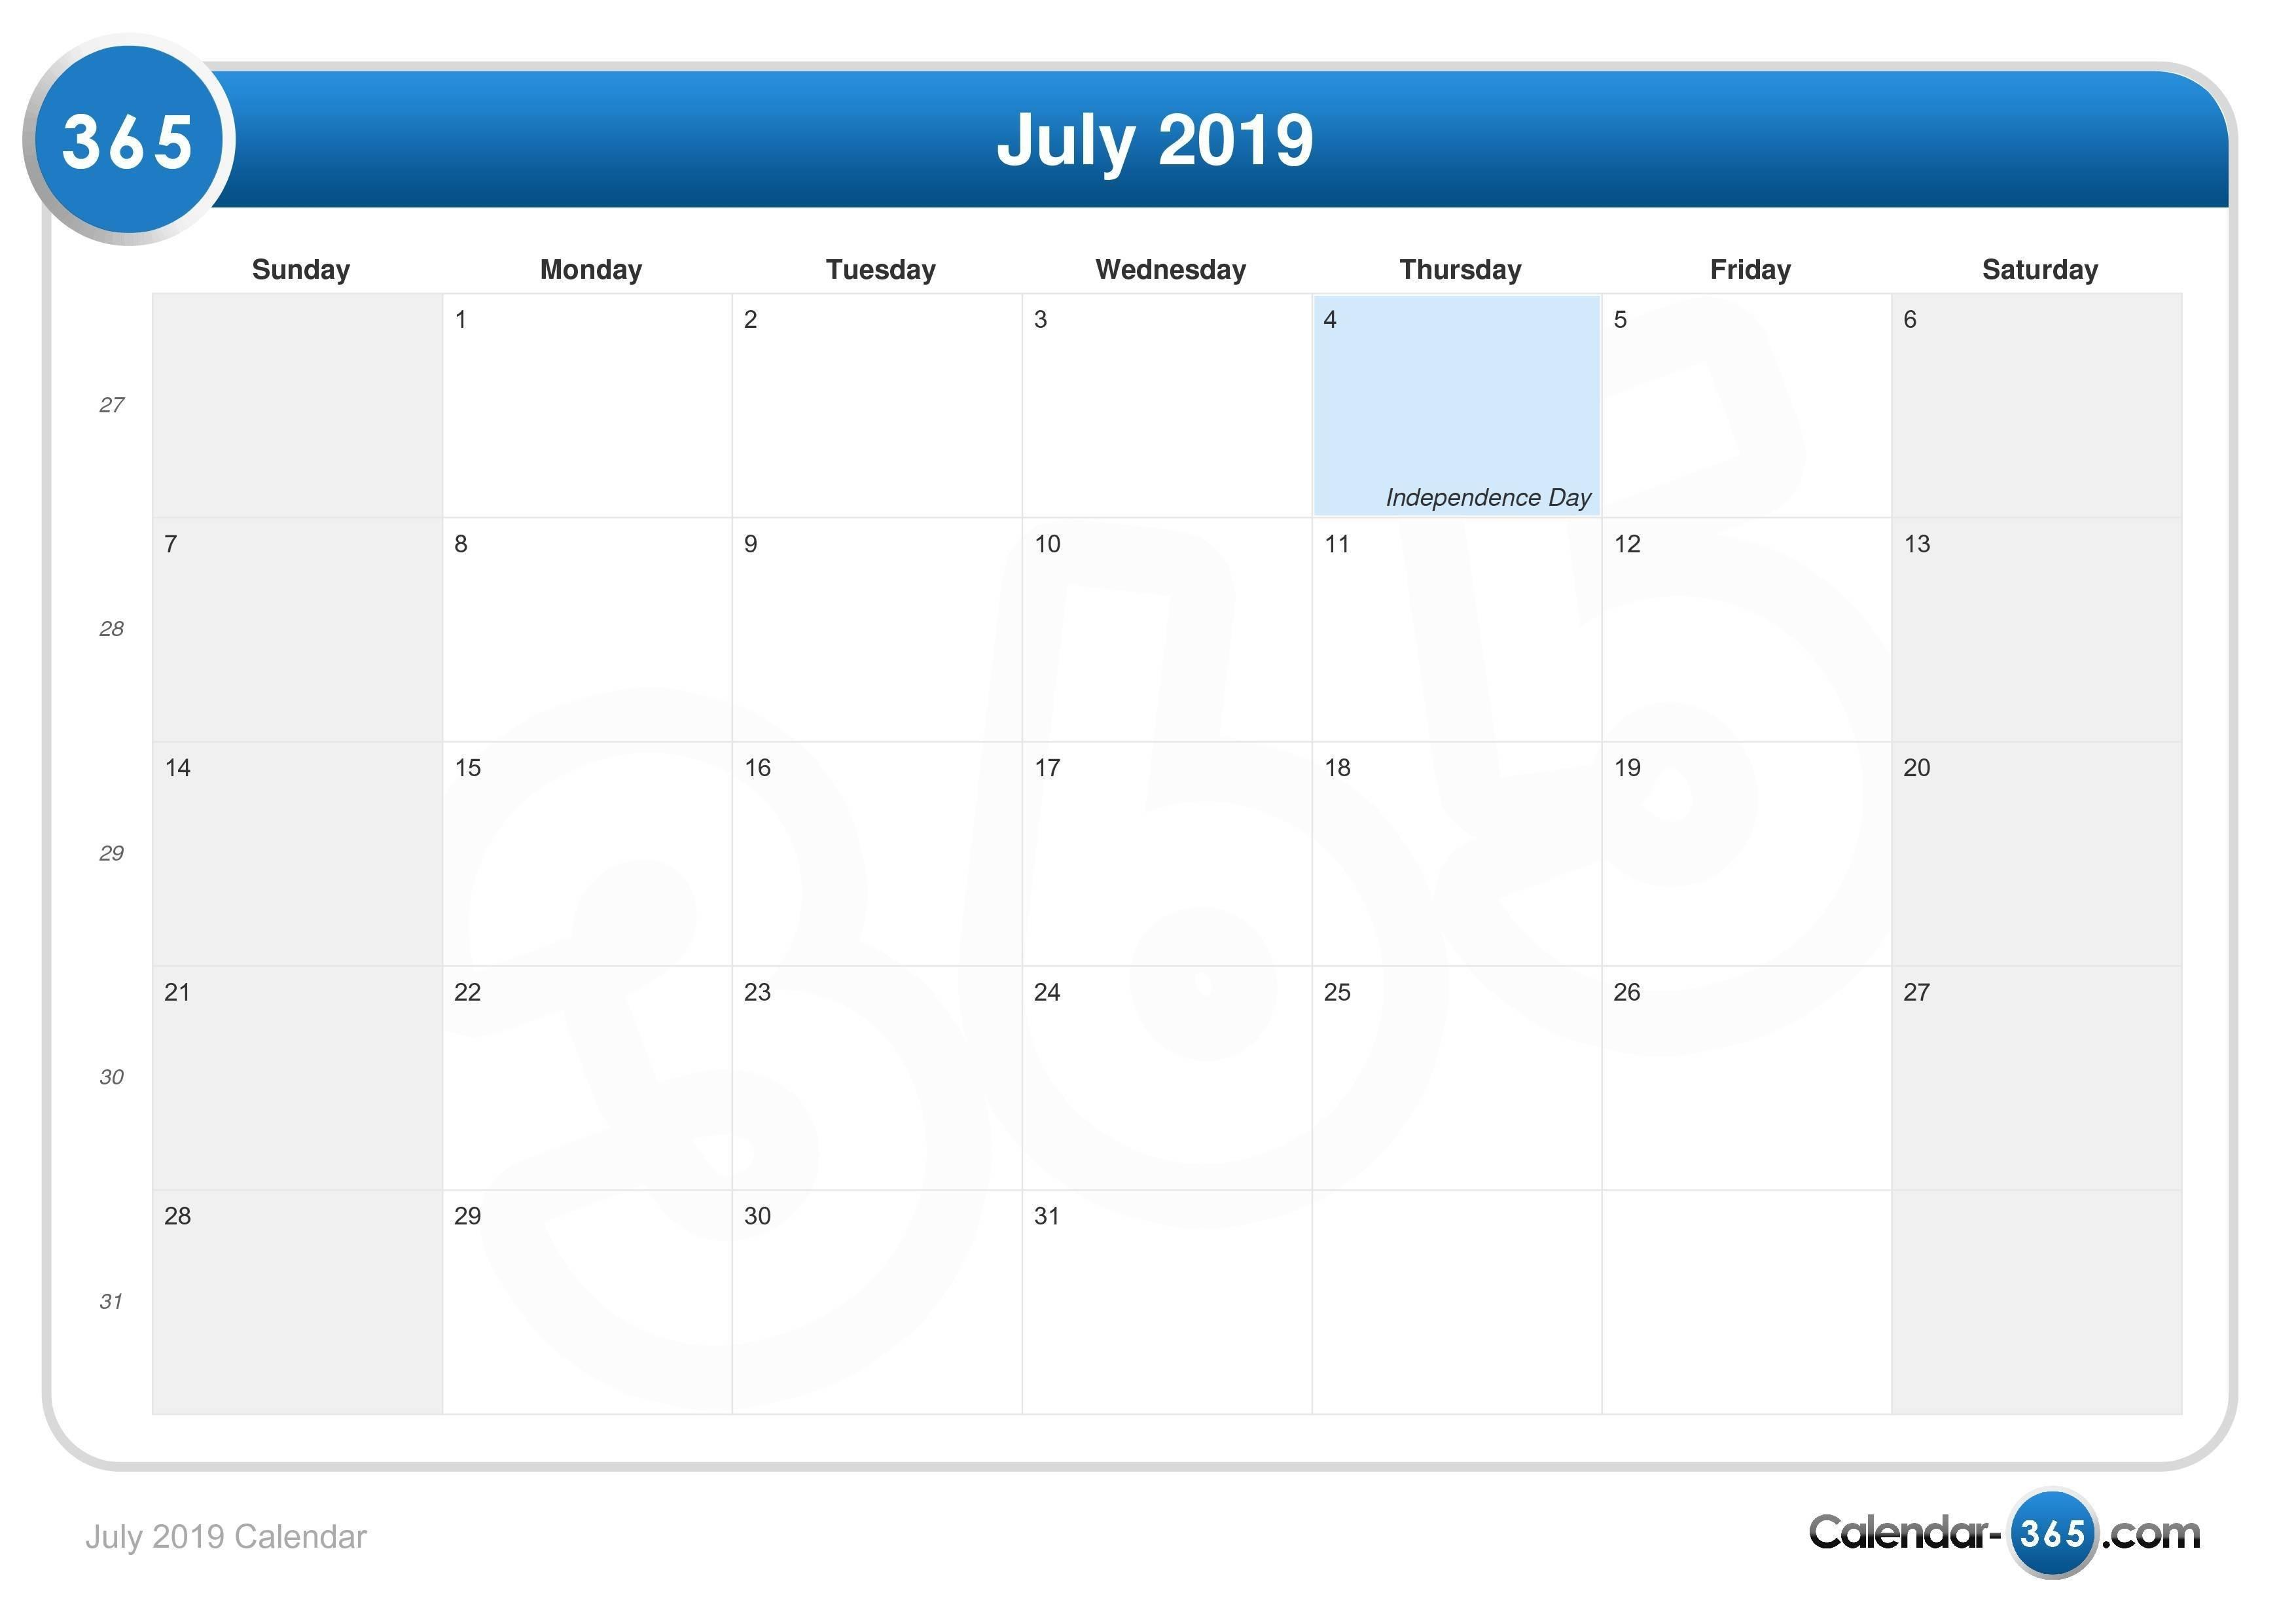 July 2019 Calendar Calendar Of 2019 July